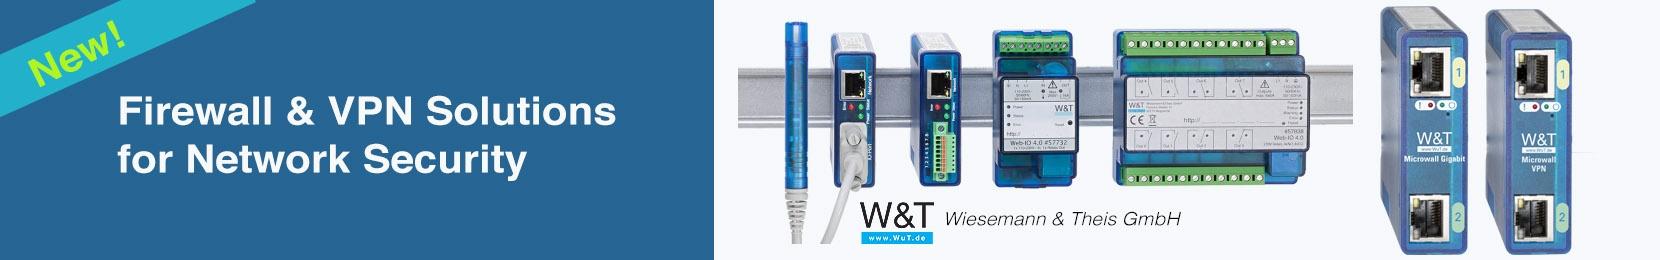 W&T_banner_firewall_VPN